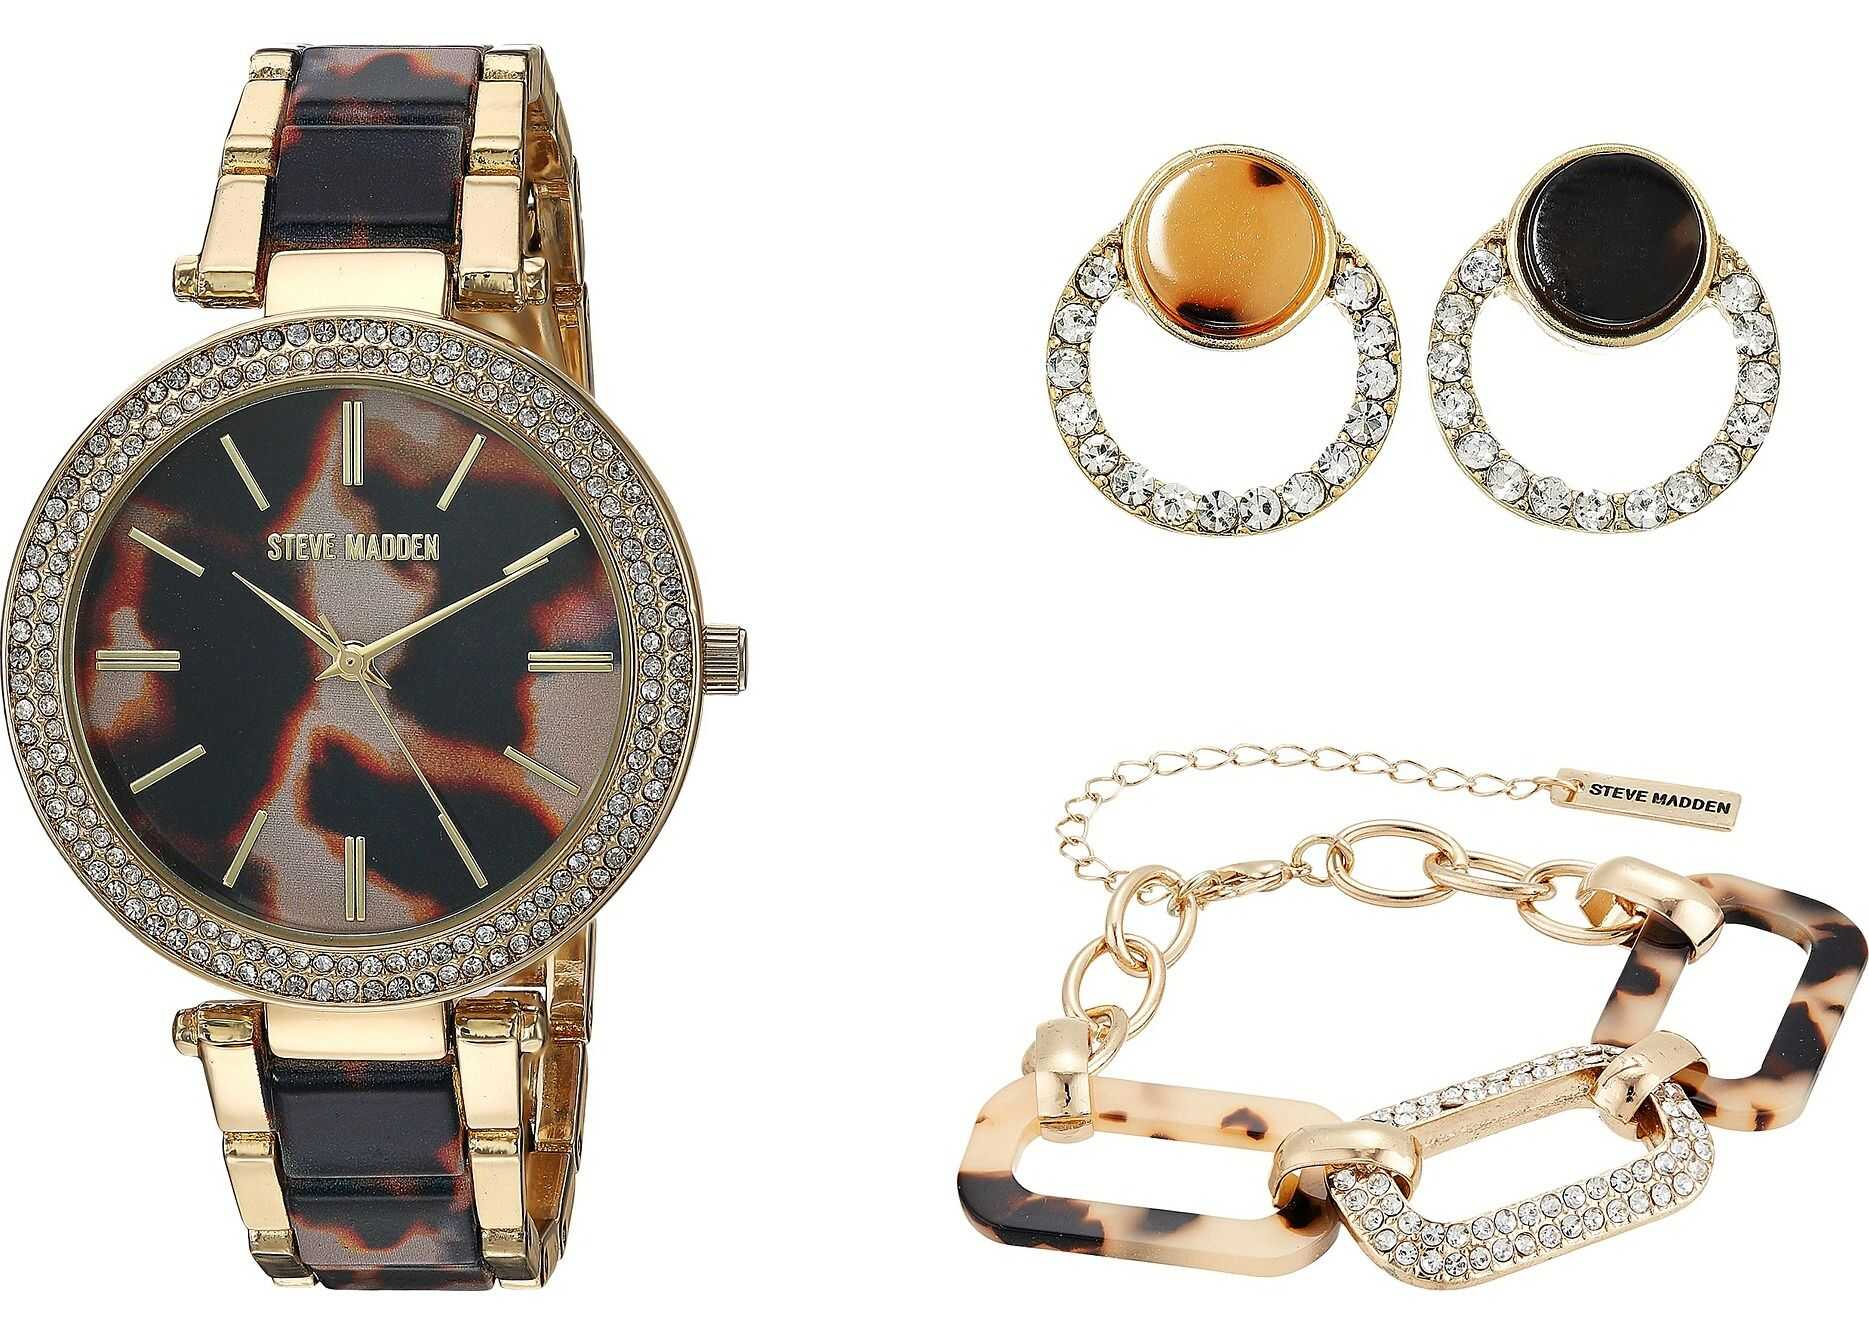 Steve Madden Bracelet, Earrings Set and Acetate Watch Set SMWS089 Gold